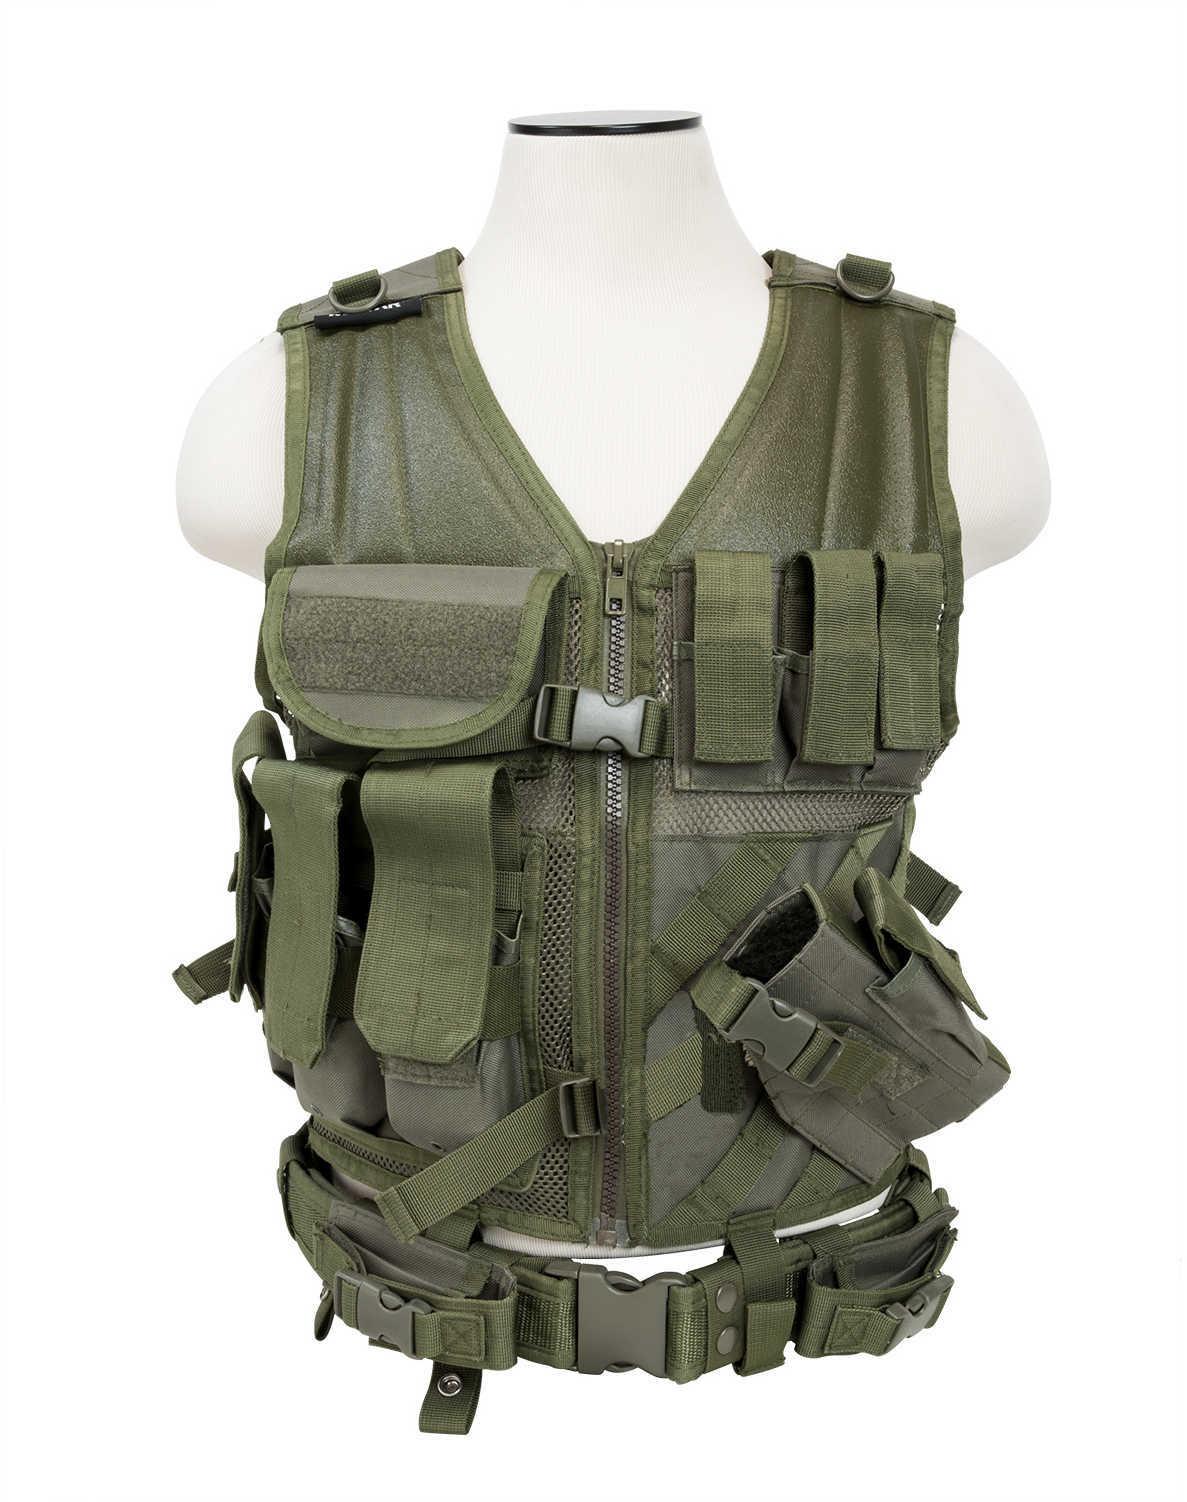 Tactical Vest Green Md: CTV2916G